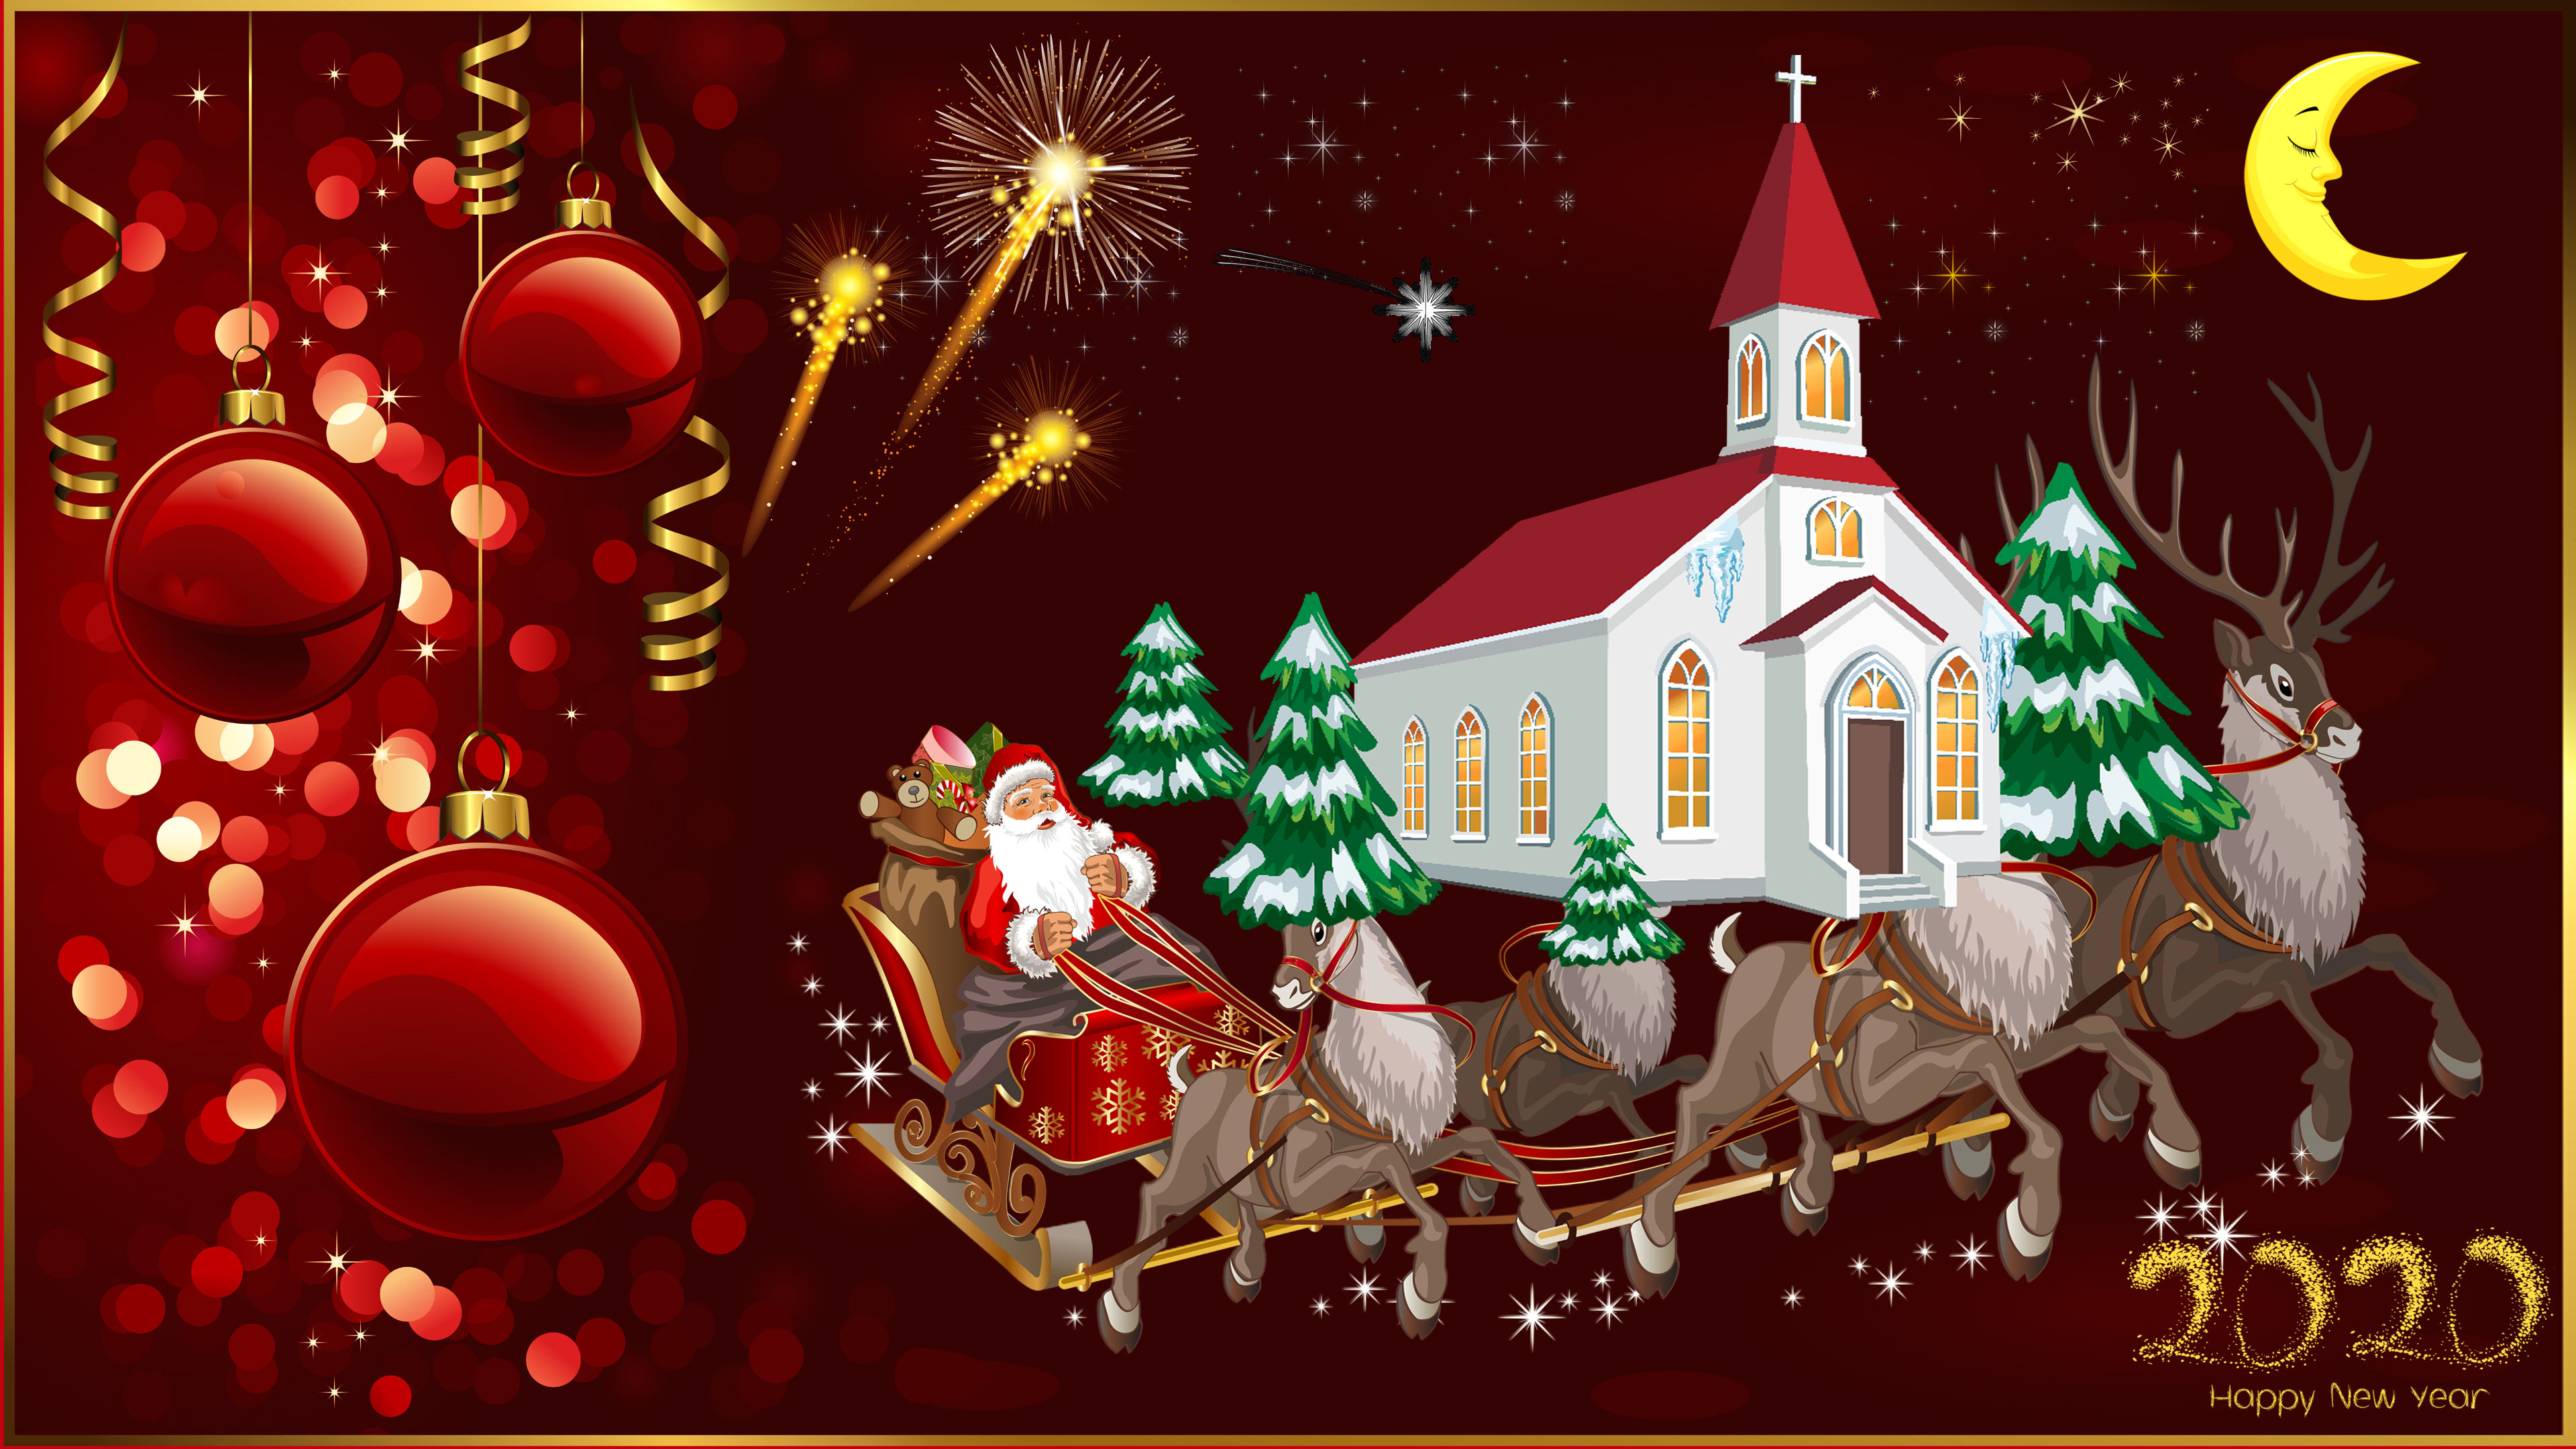 Happy New Year 2020 Merry Christmas Christmas Greeting Card Santa 3840x2160